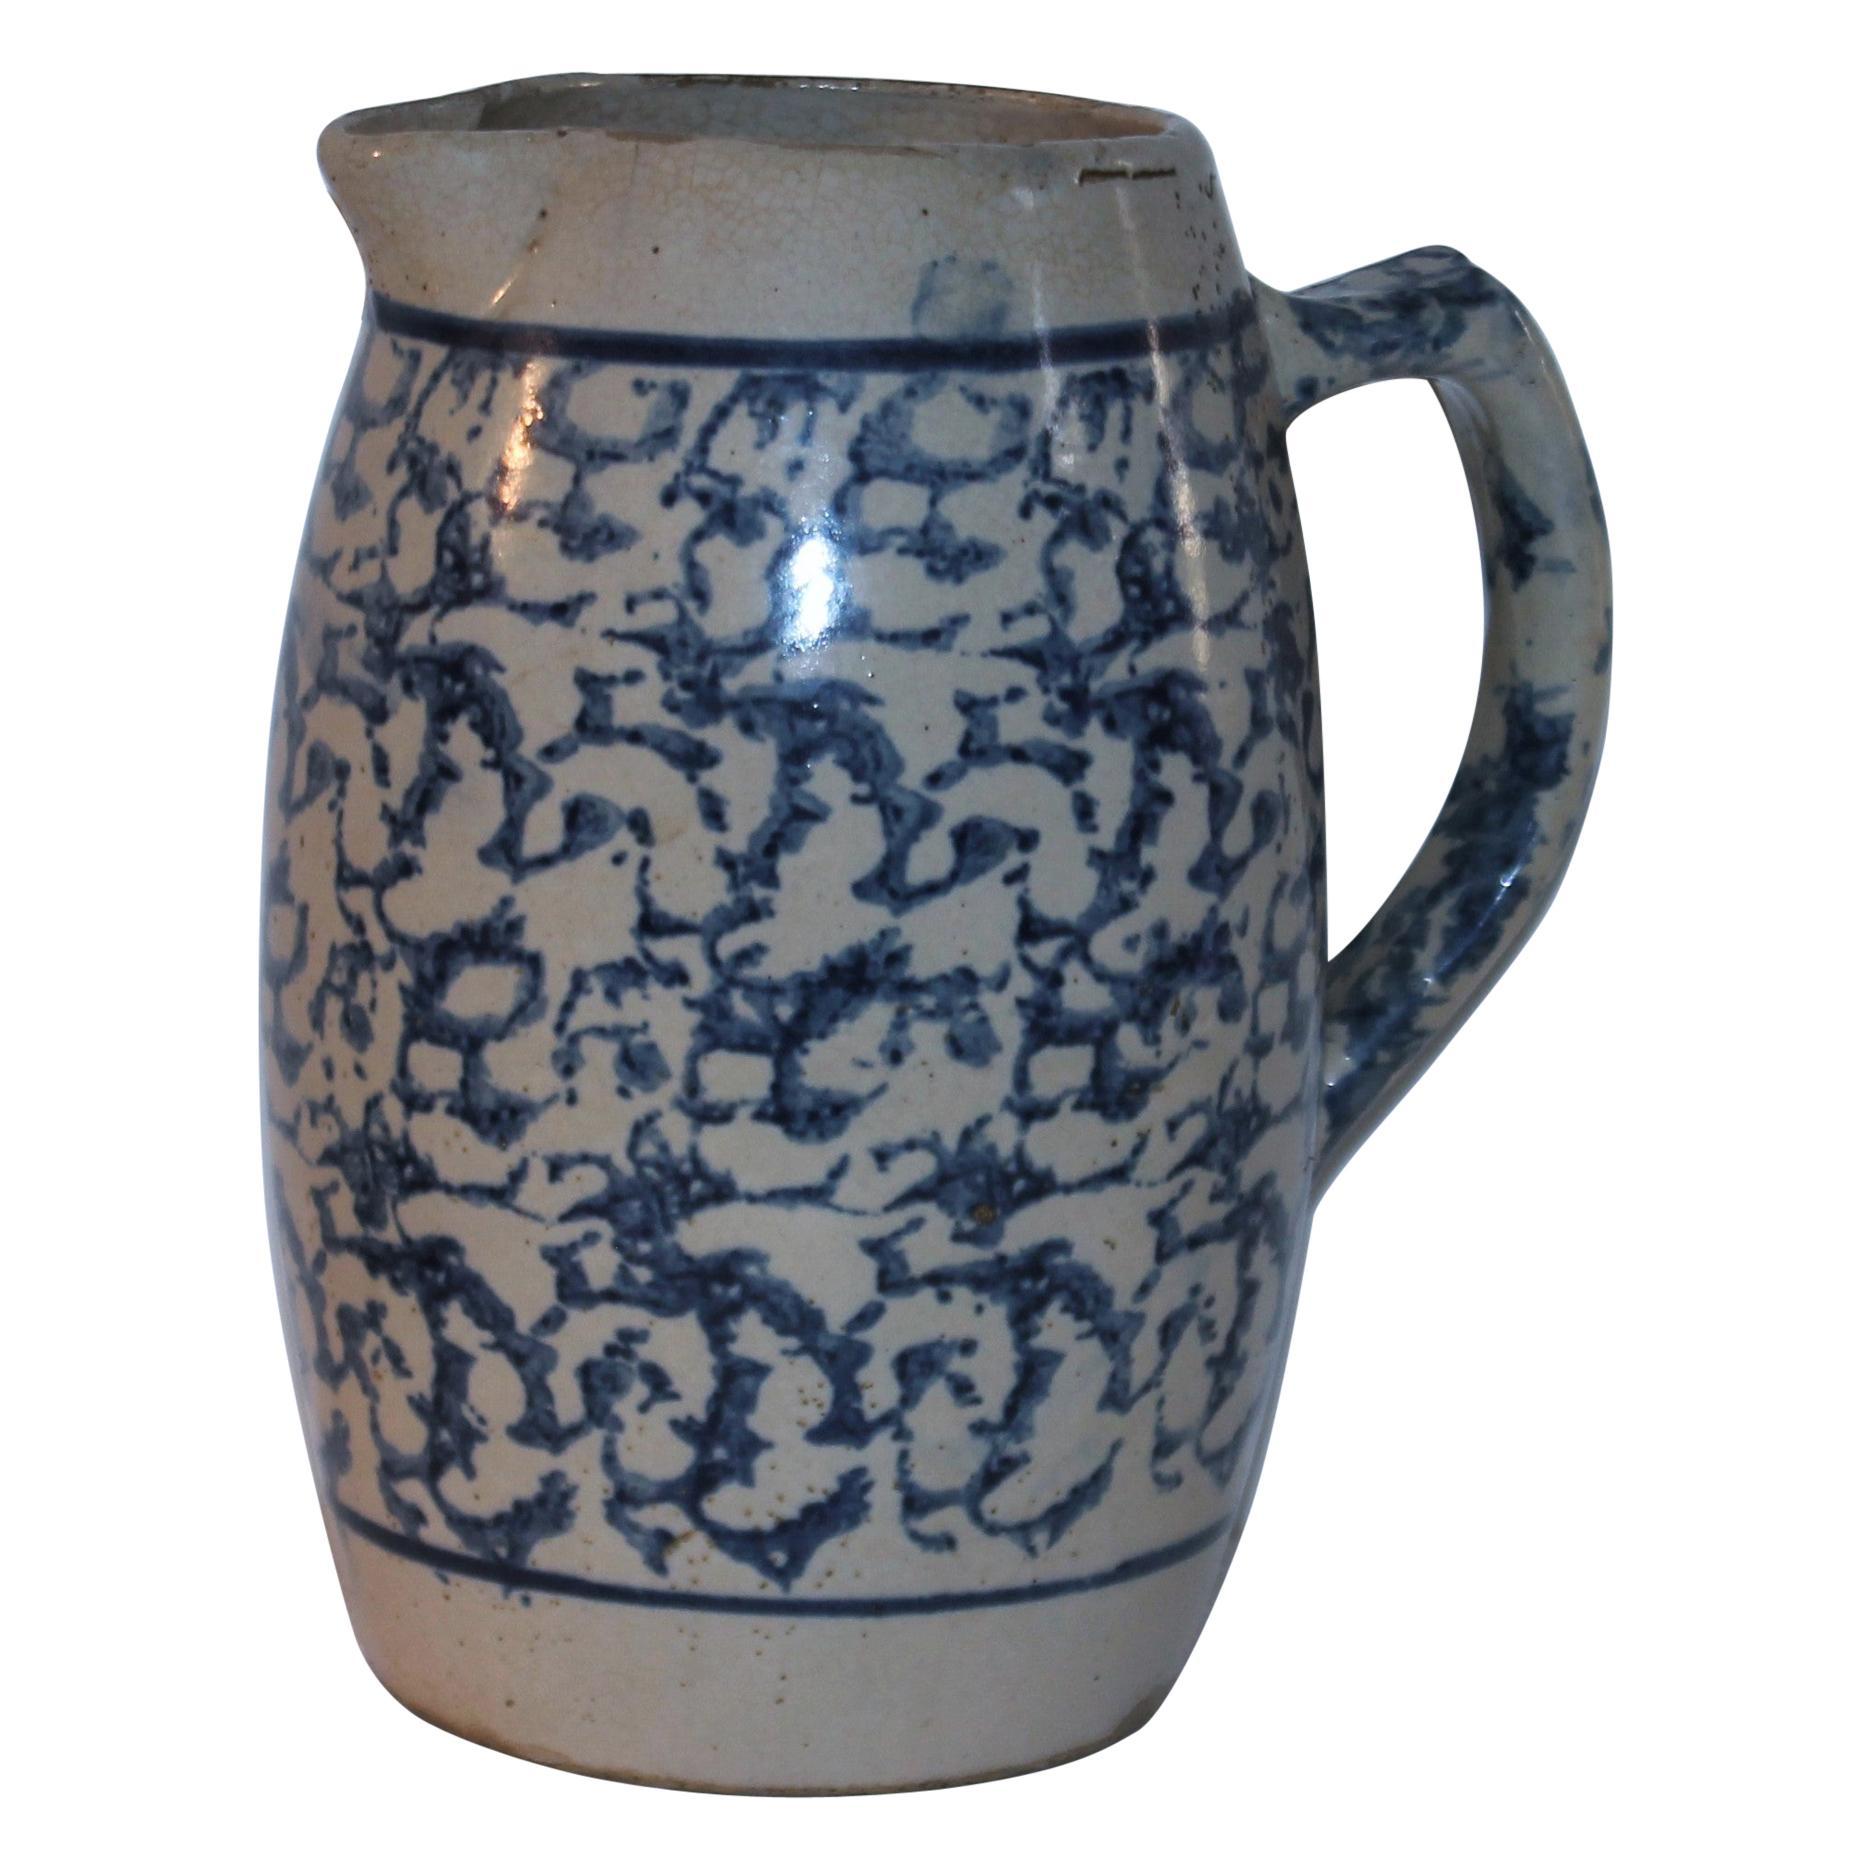 19thc Sponge Ware Barrel Pottery Pitcher